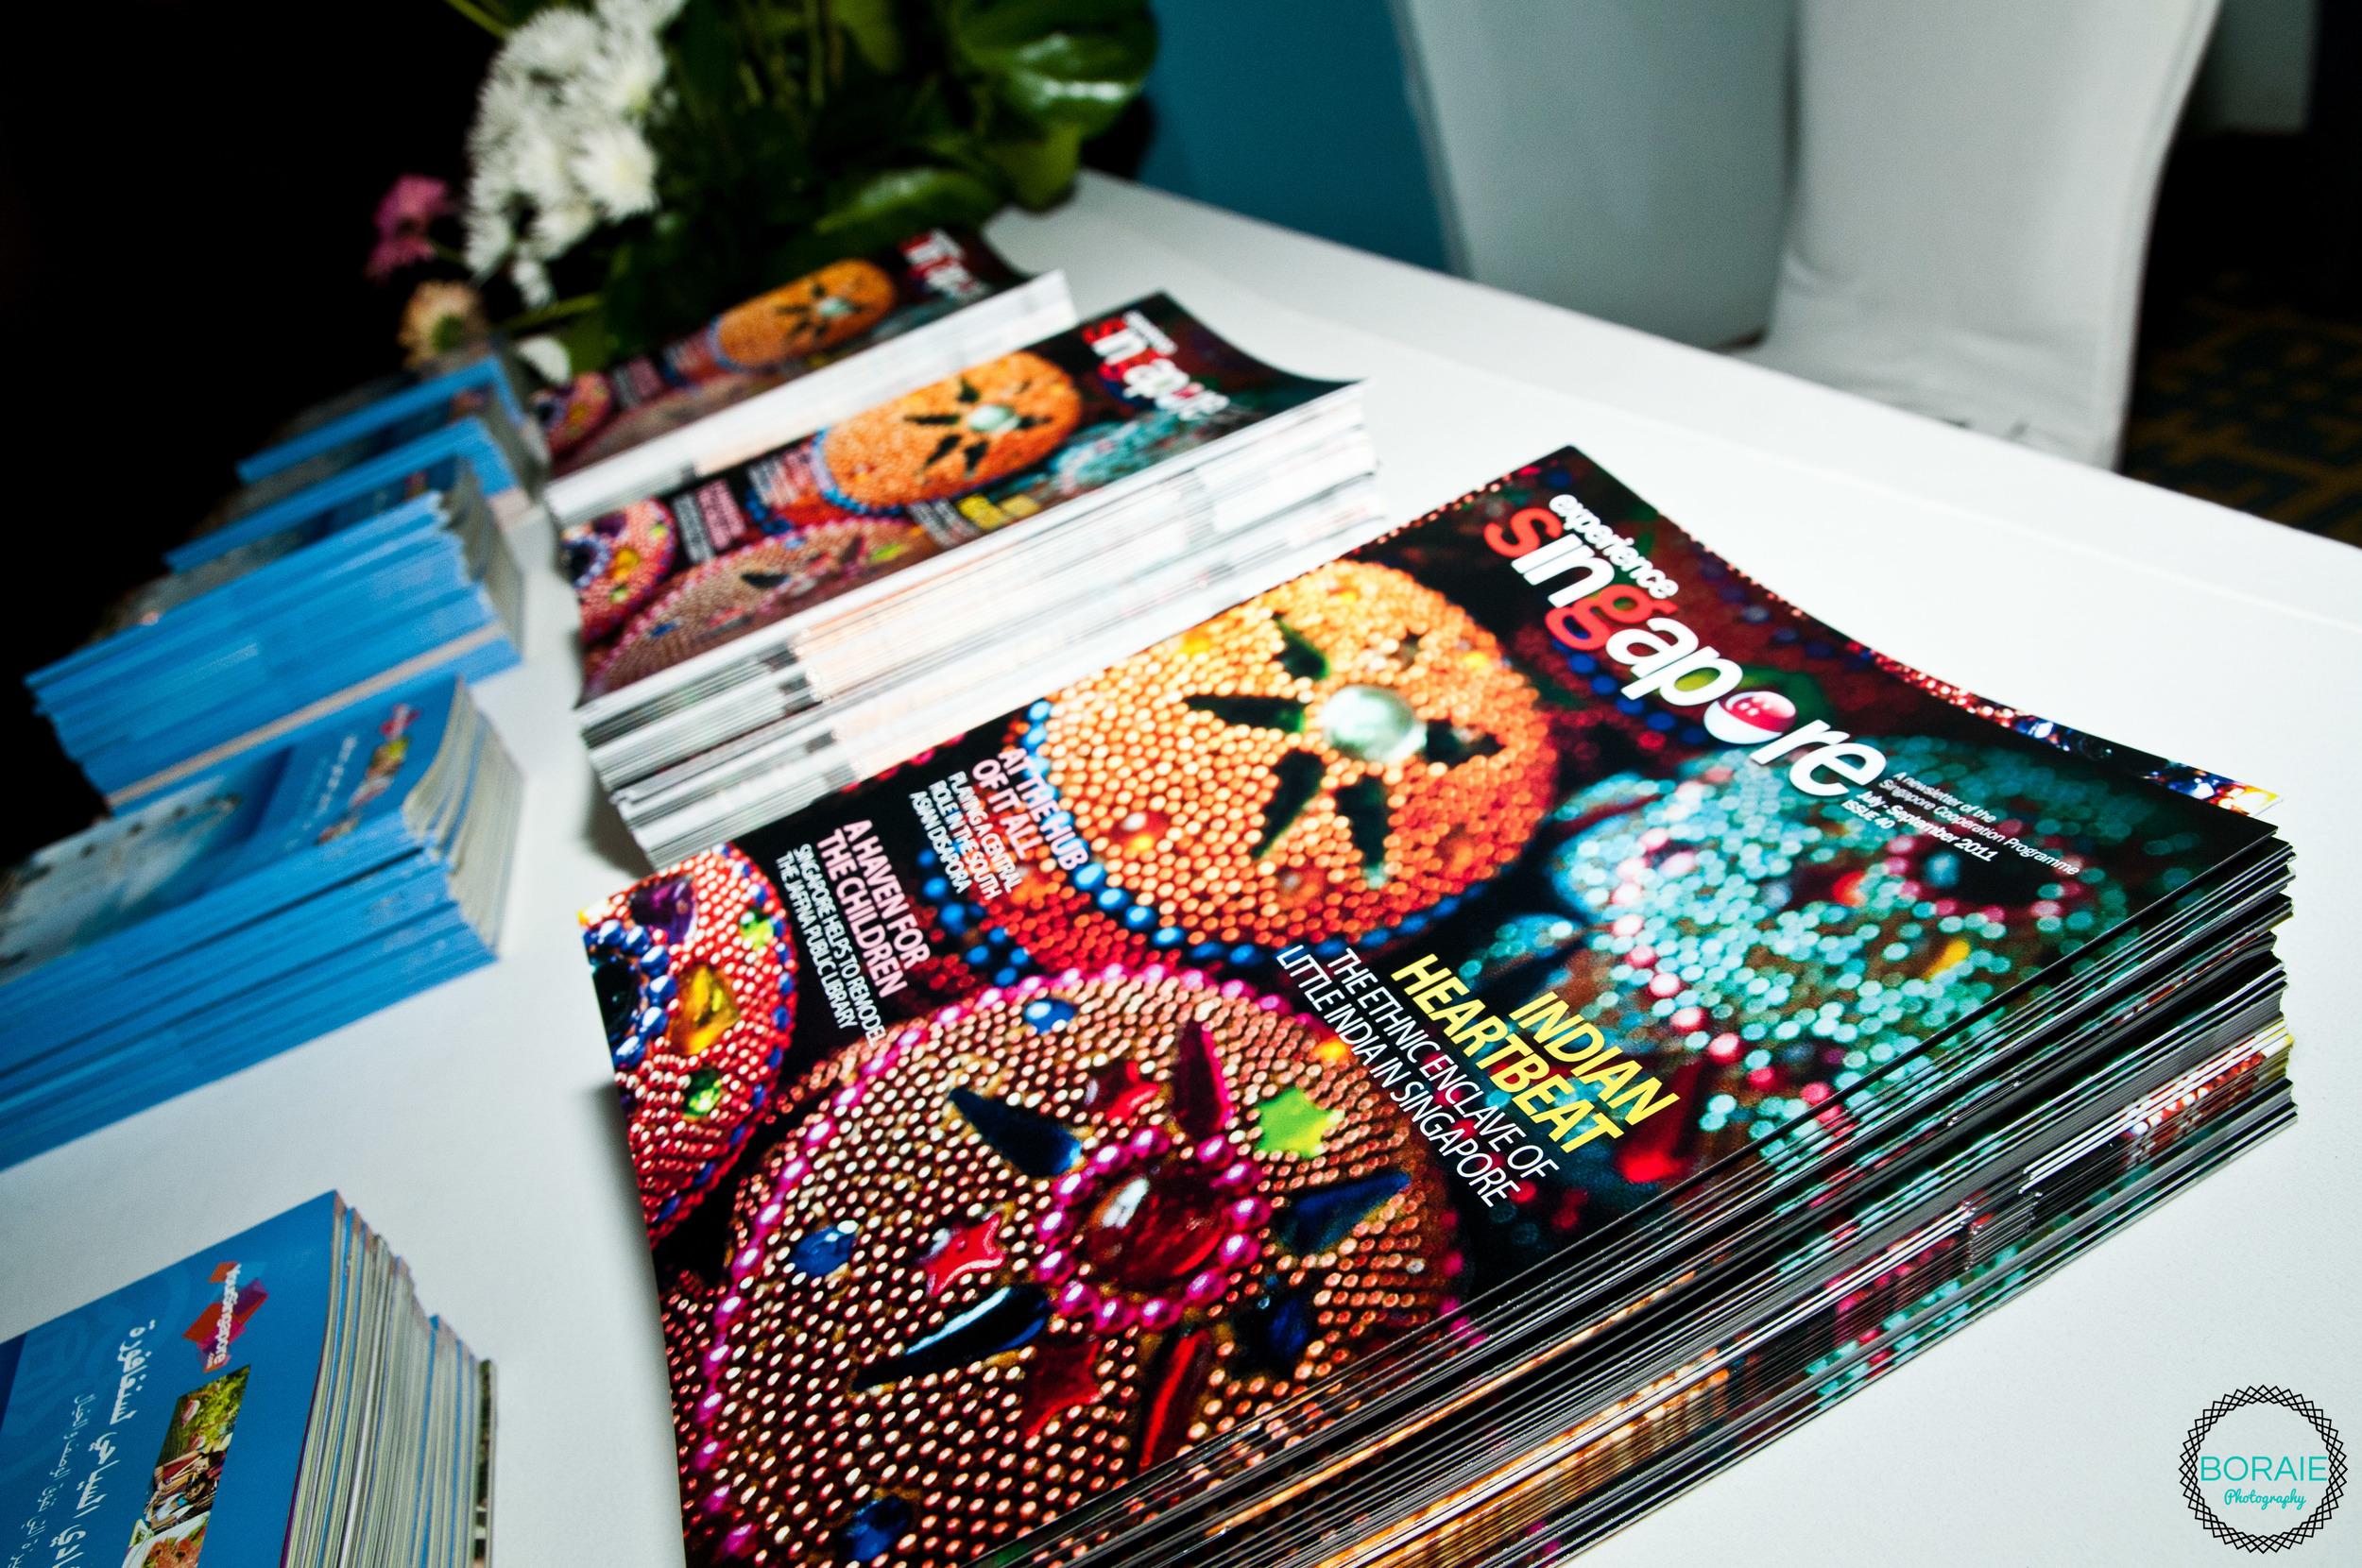 Boraie Photography - (www.boraiephotography.com) -14.JPG